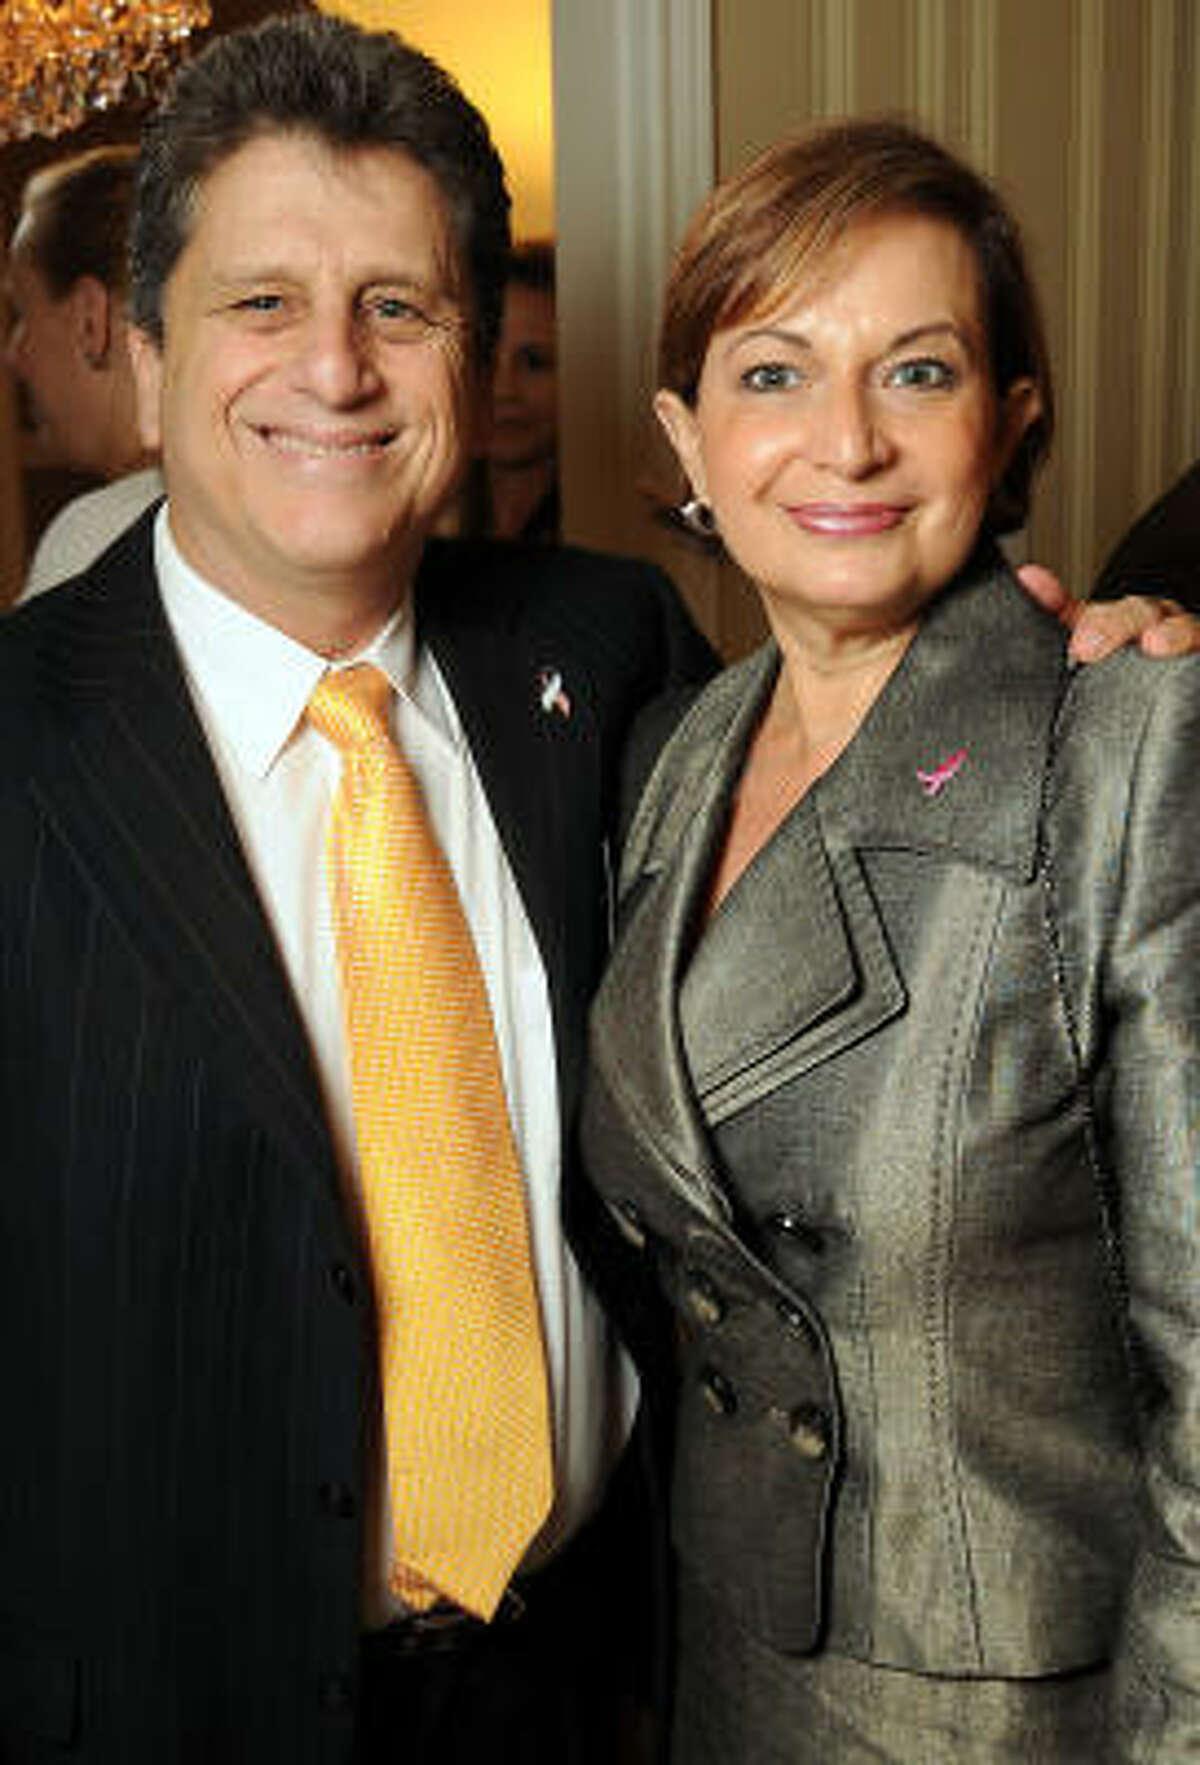 Yoav Weiss and Maria Jibaja-Weiss